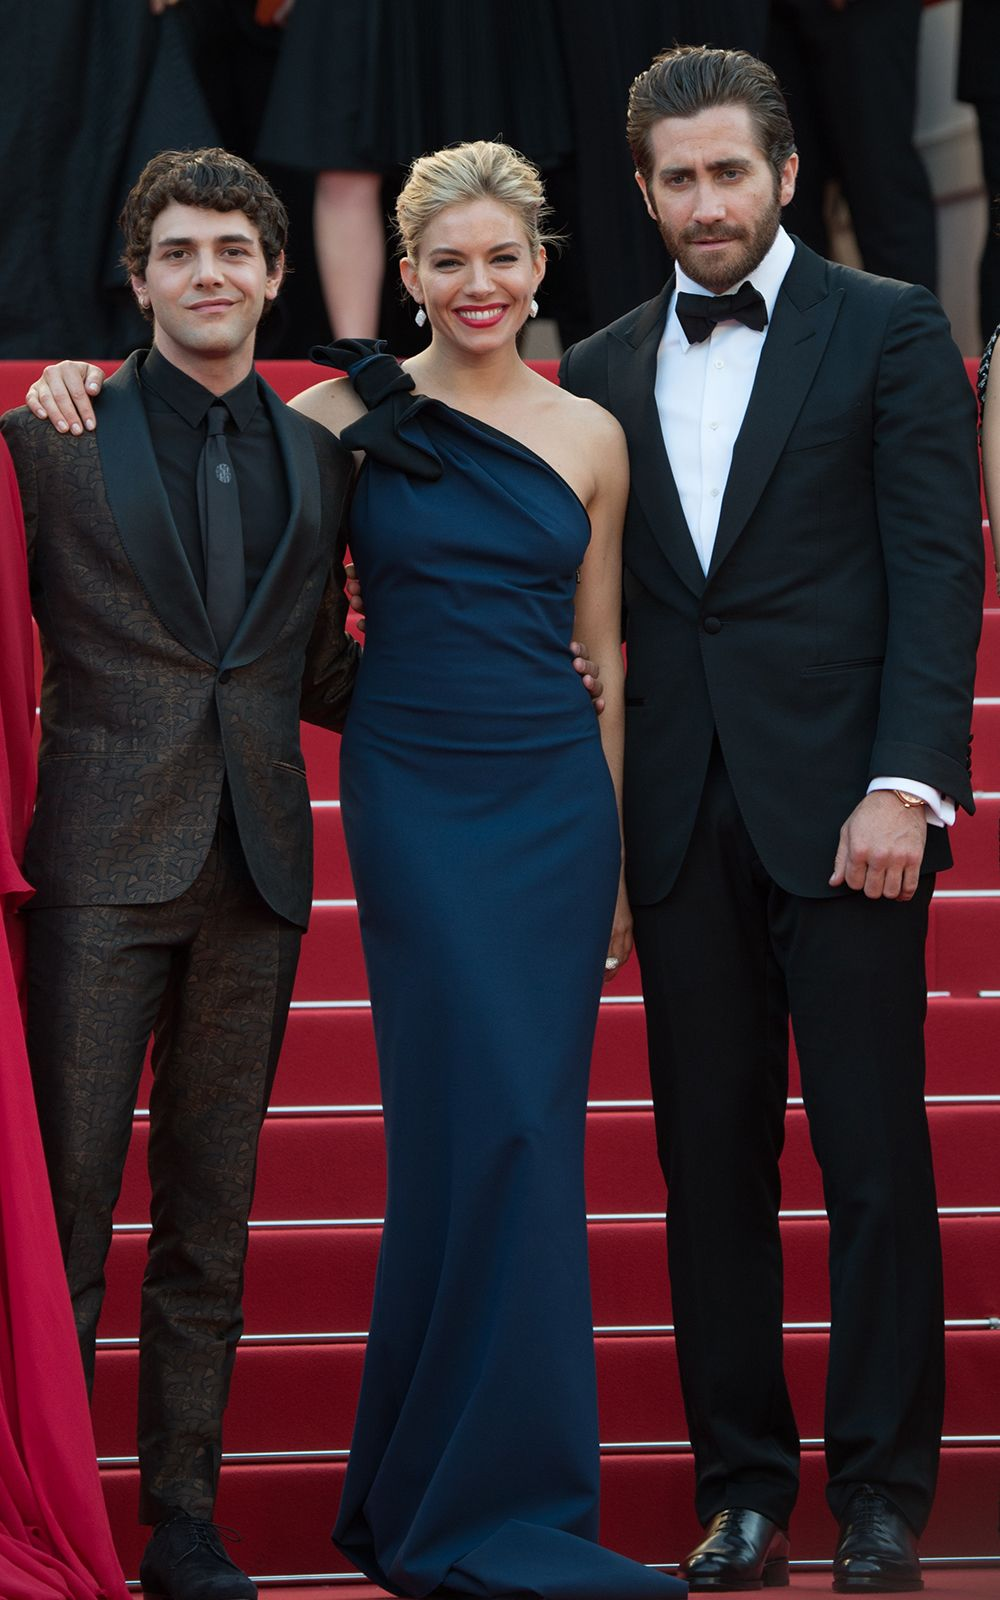 Festival de Filme de Cannes  2015: Tapete Vermelho | Harper's Bazaar